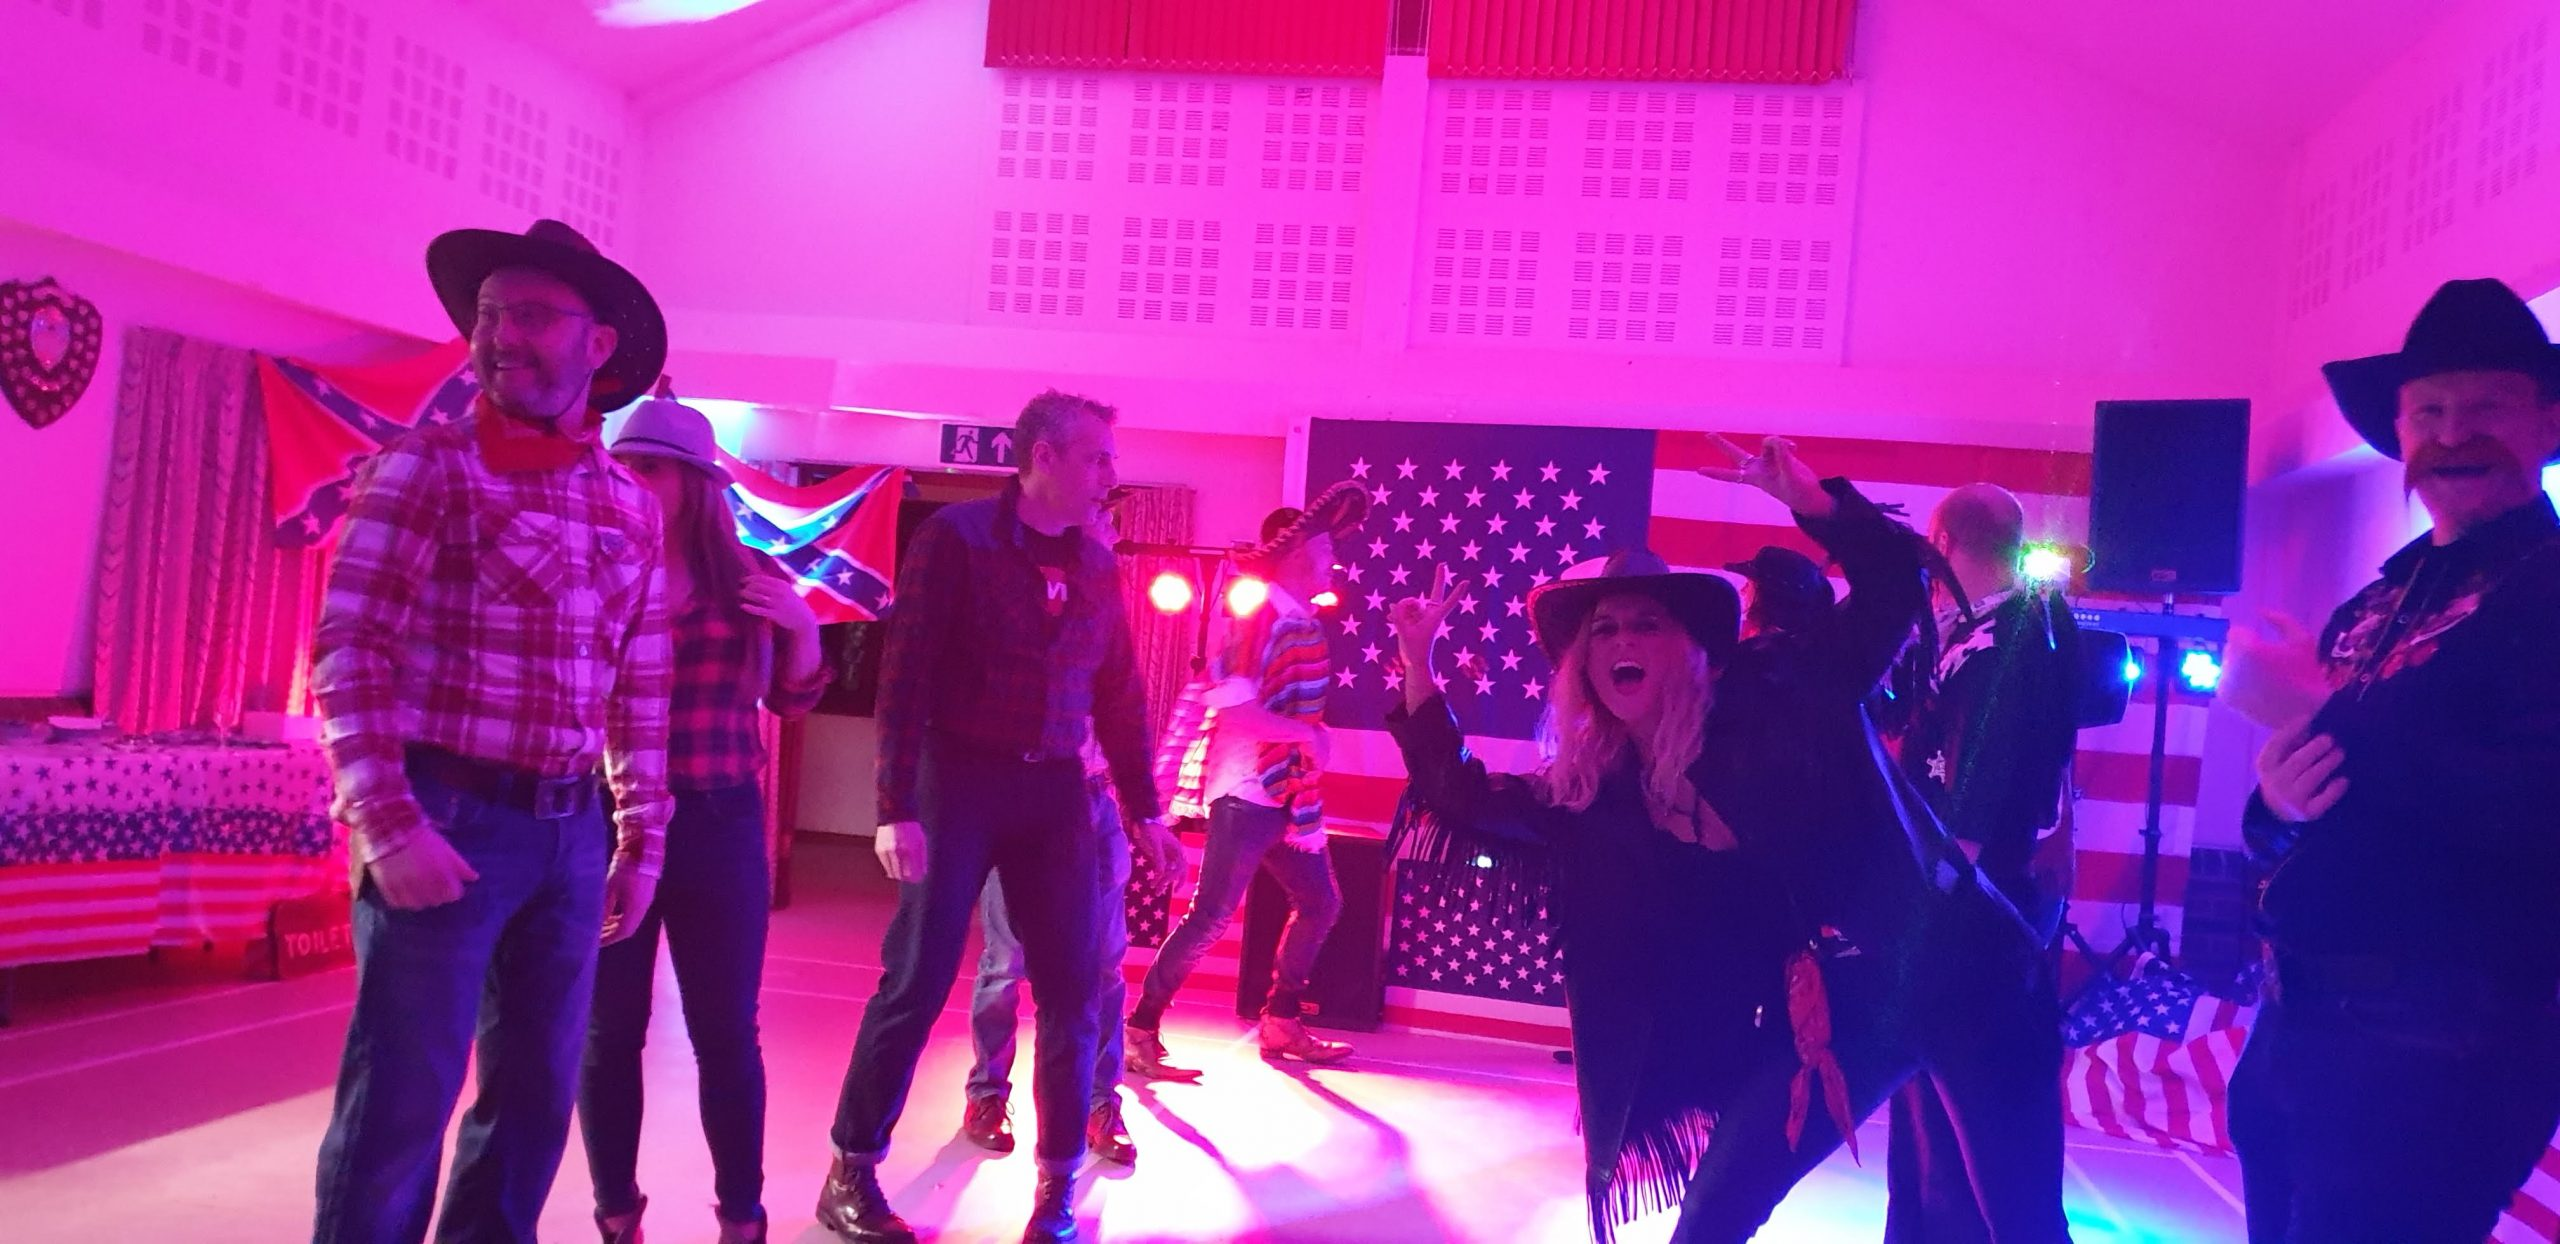 BARN DANCE AND LINE DANCE CALLER HIRE IN CAMBRIDGESHIRE